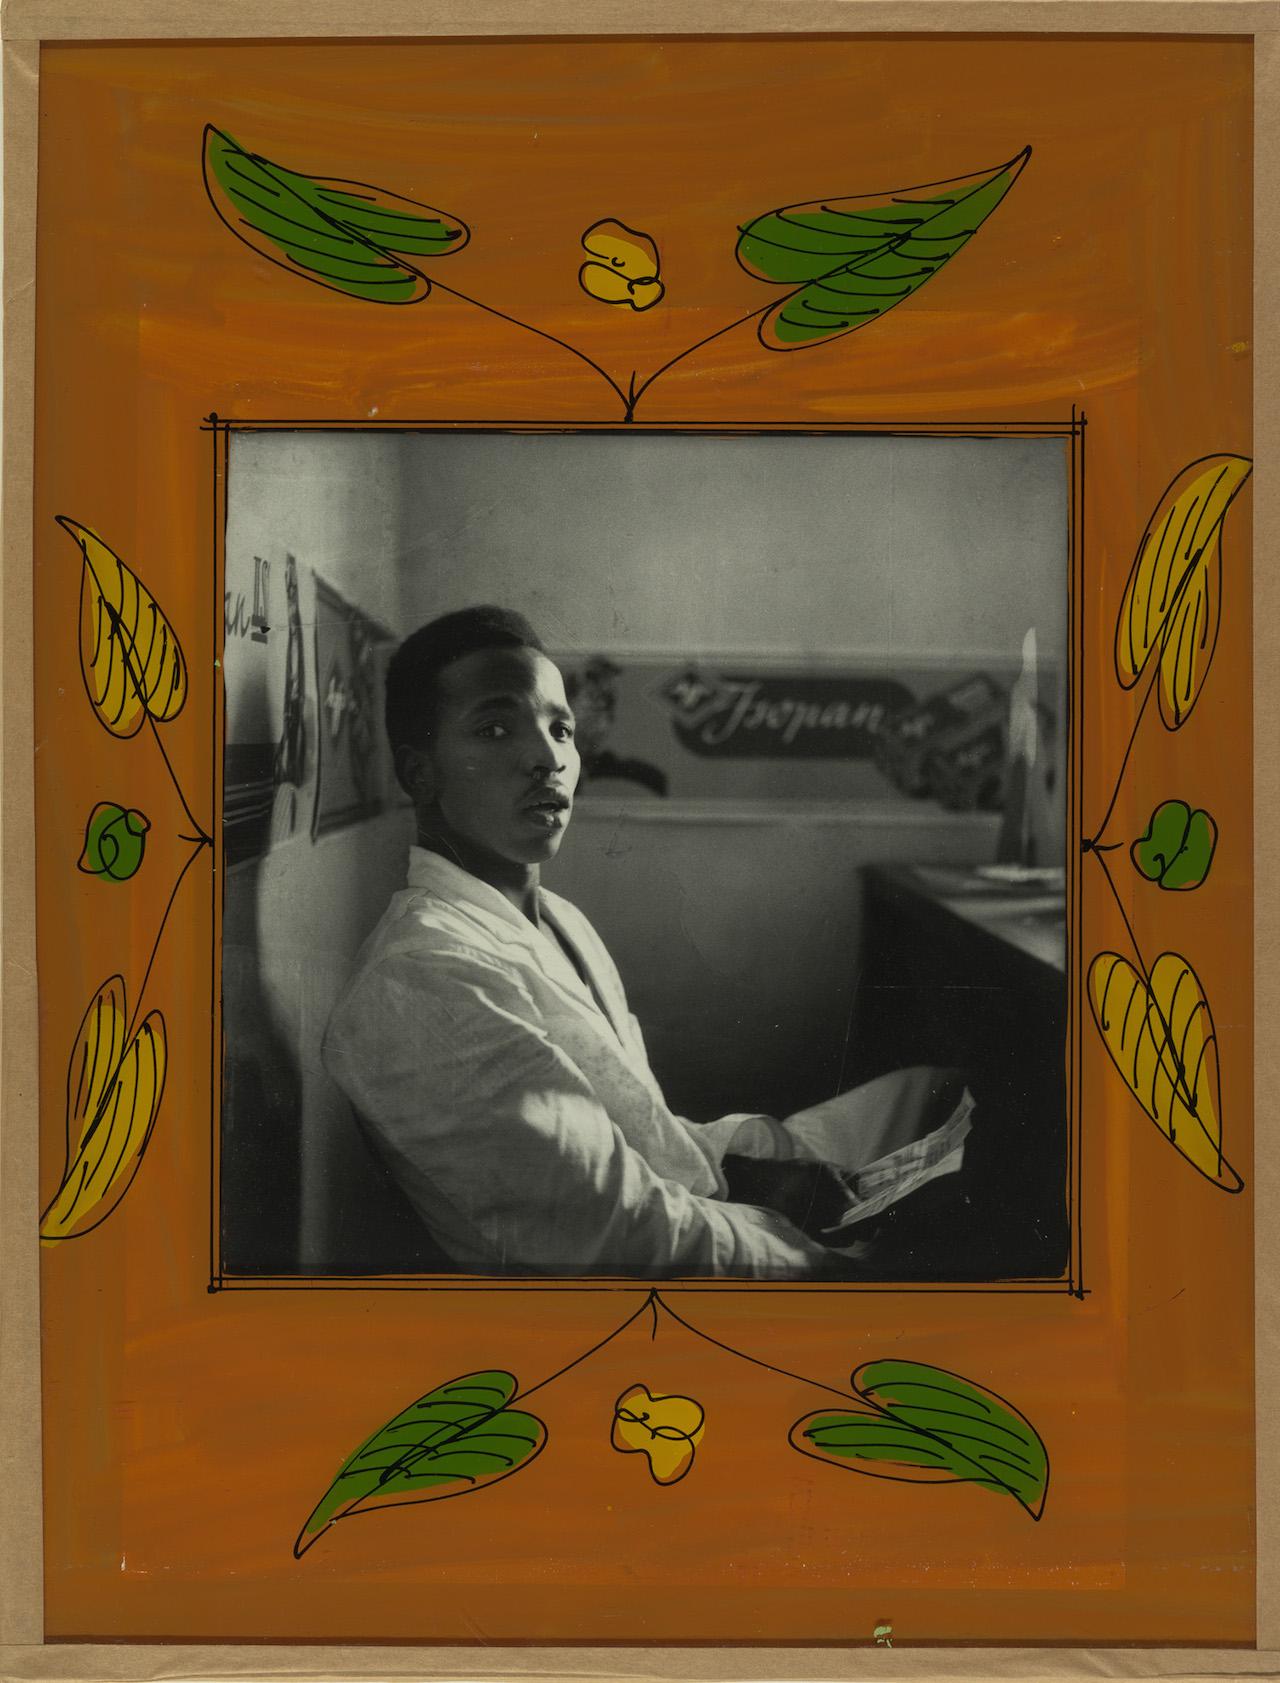 Malick Sidibé (Malian, b. 1936) Self-Portrait, 1956 Gelatin silver print in original frame of reverse-painted glass, tape, cardboard, string Gift of Jack Shainman and Claude Simard, 2014 (2014.638)